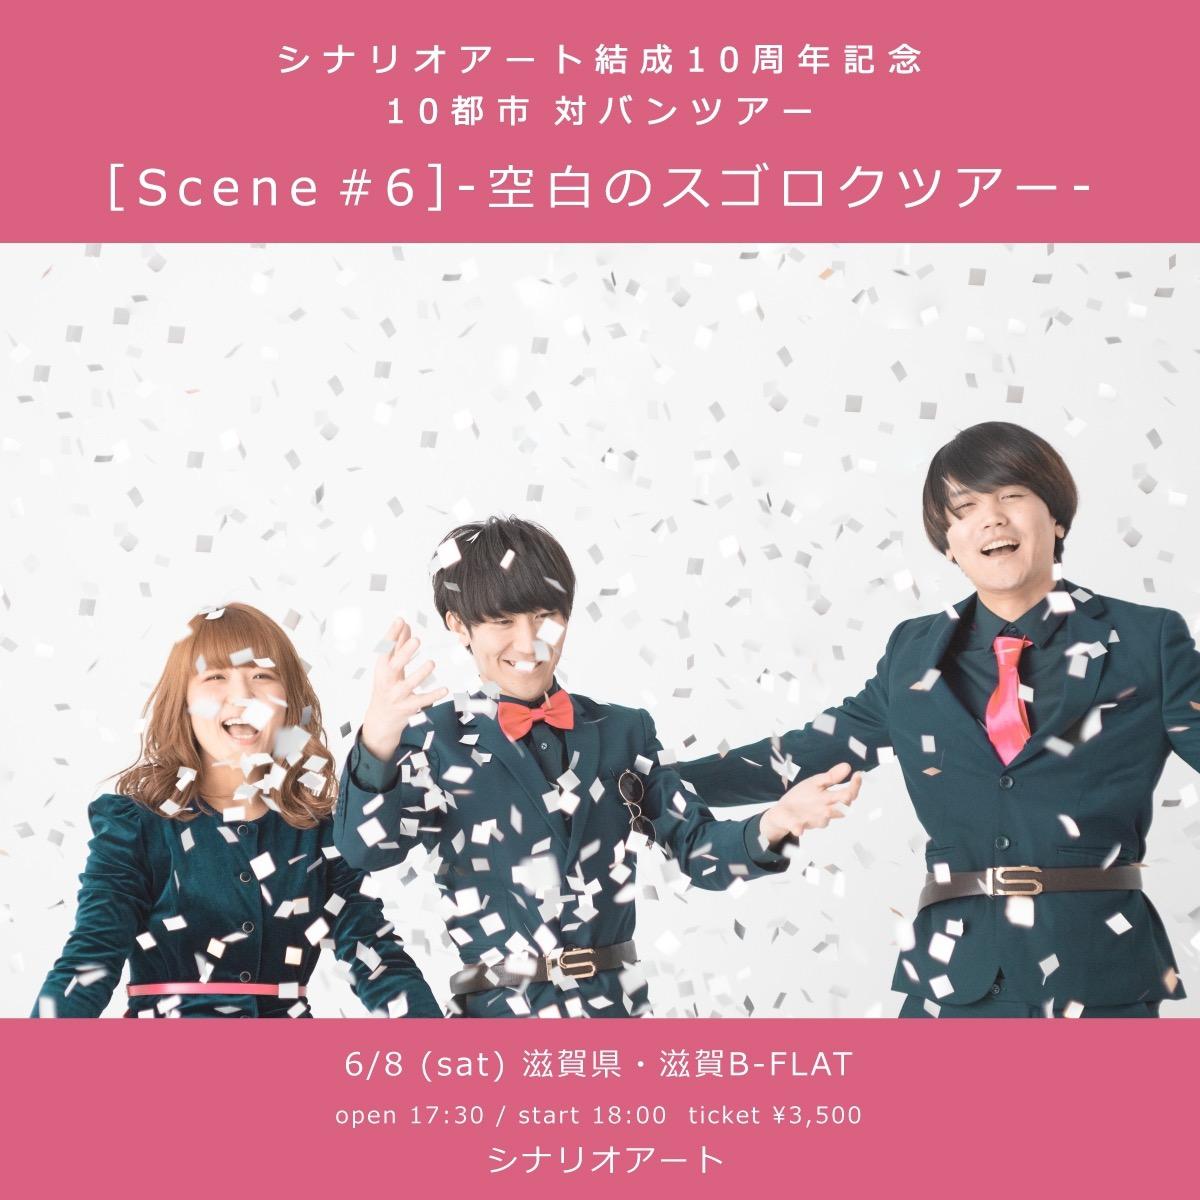 [Scene #6]-空白のスゴロクツアー- 《滋賀ワンマン公演》